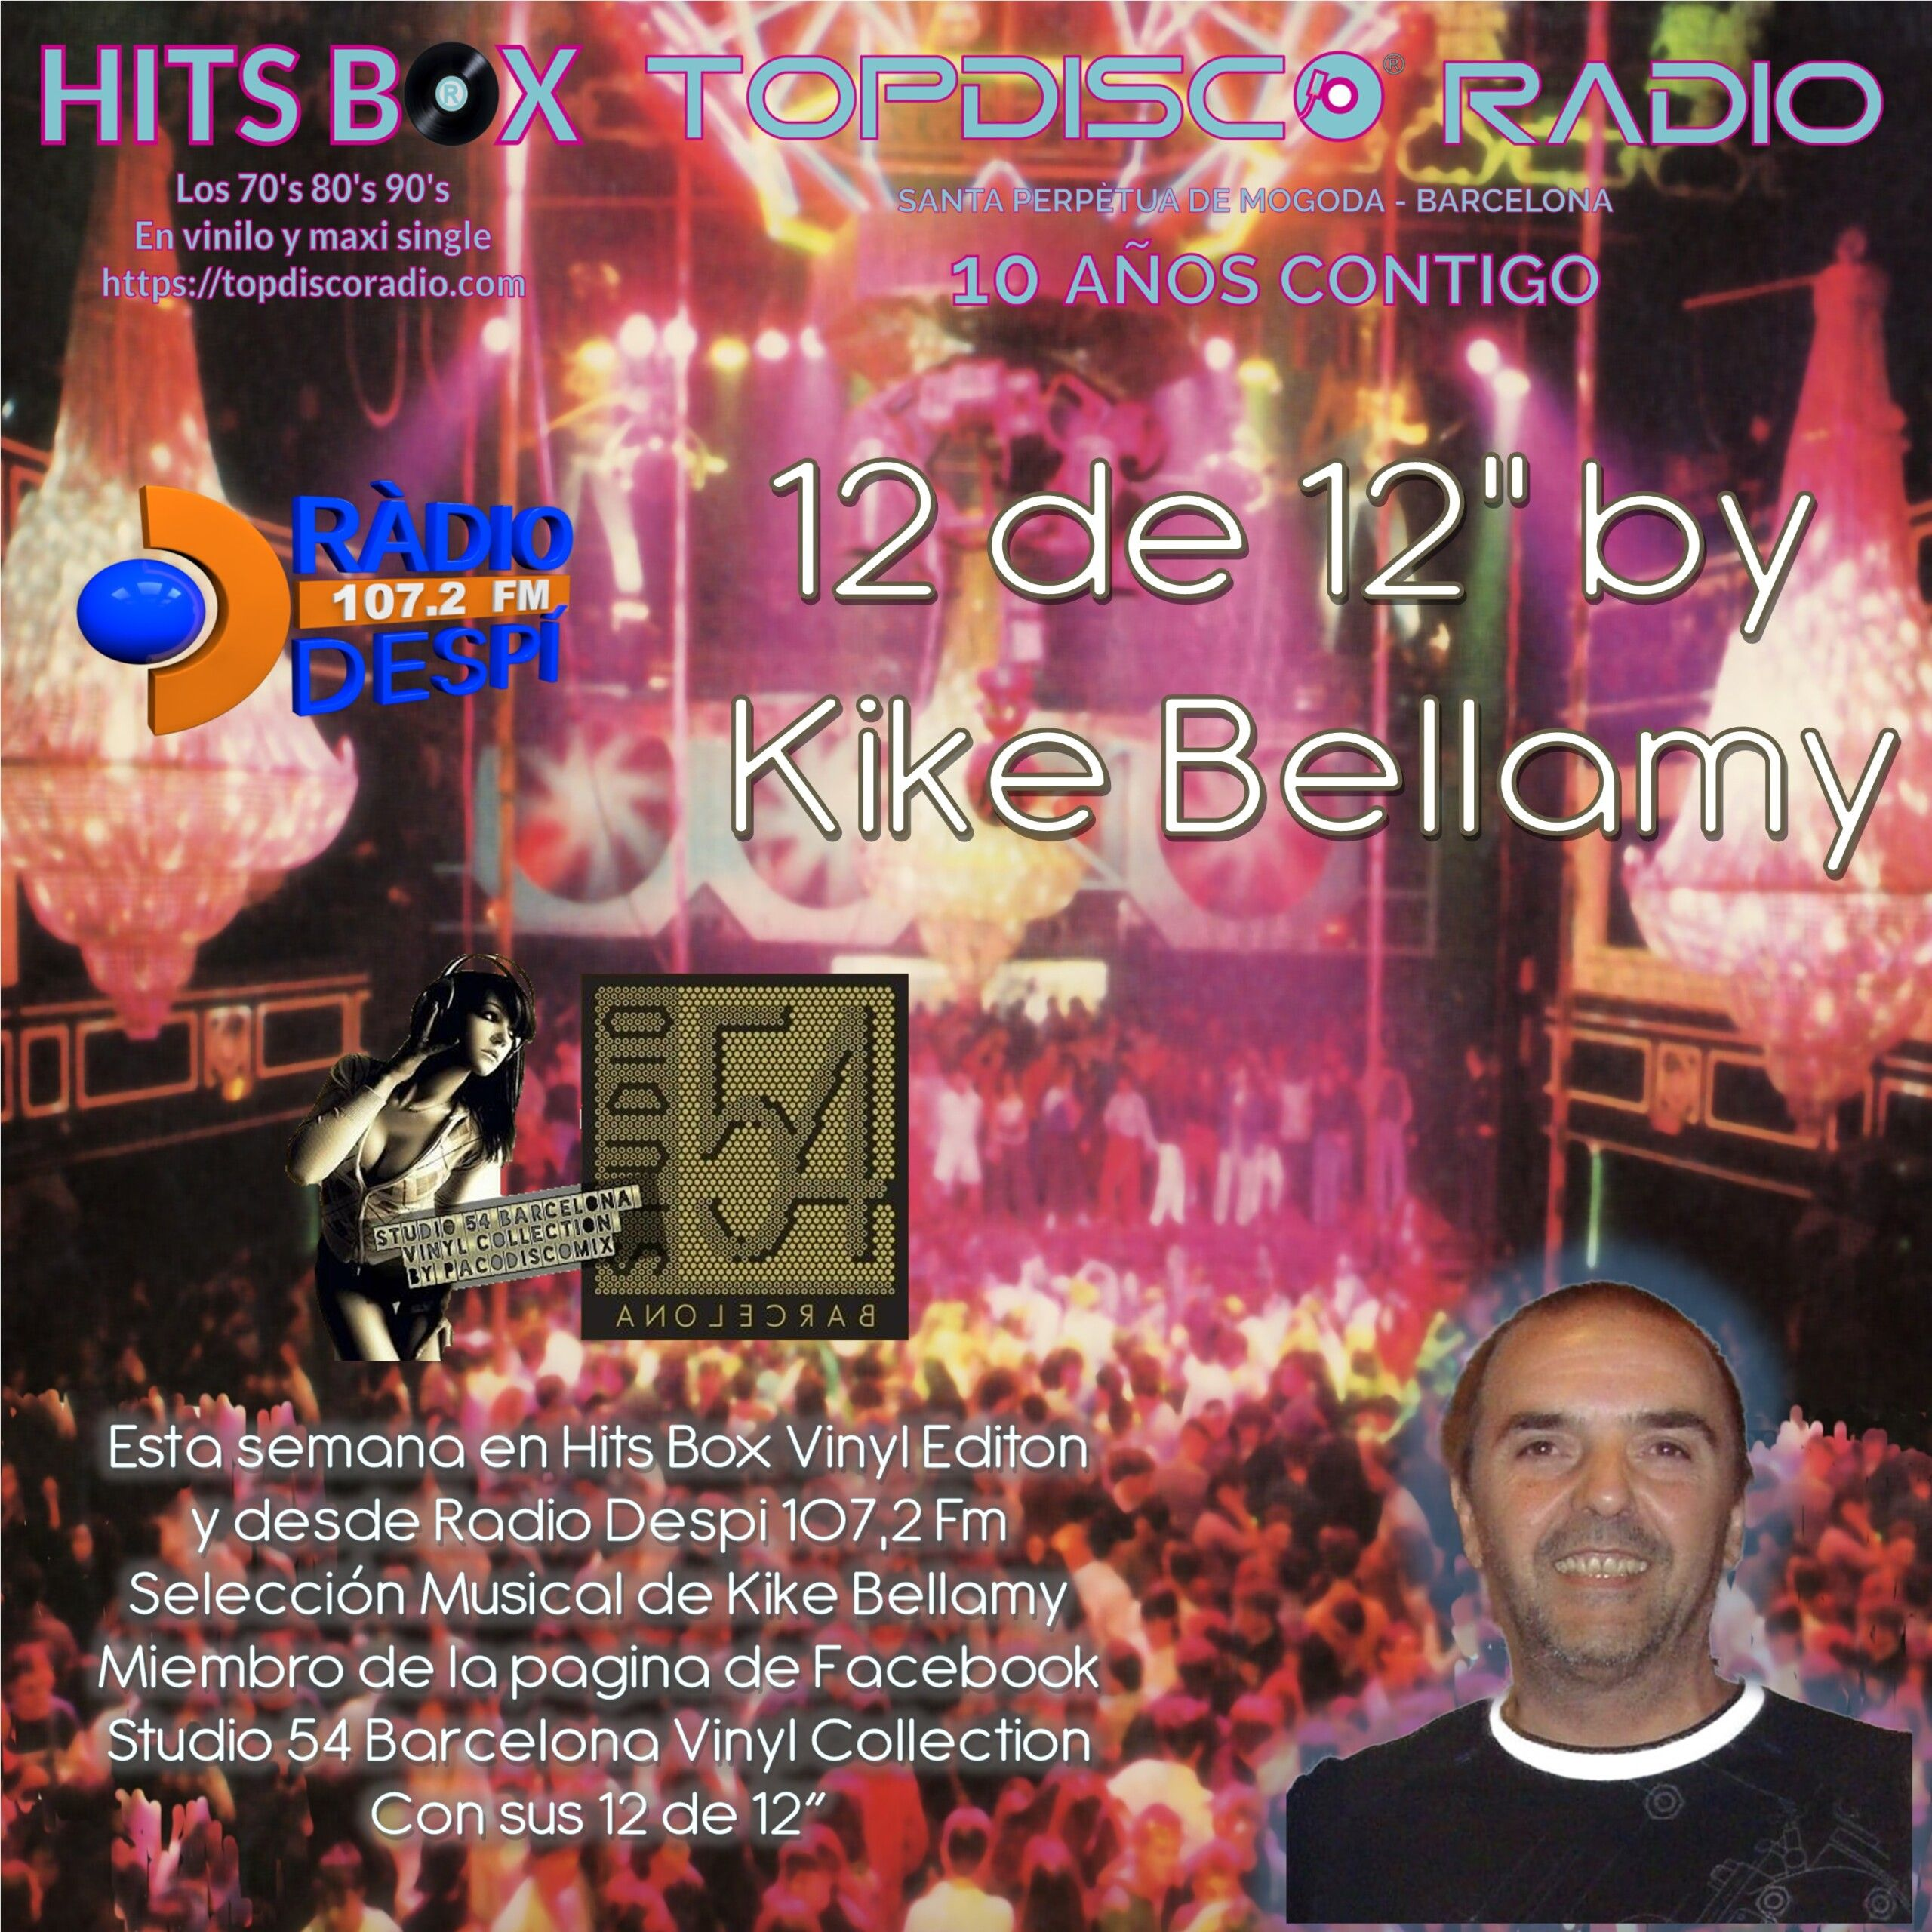 12 de 12 Kike Bellamy - Topdisco Radio - Hits Box - Radio Despi